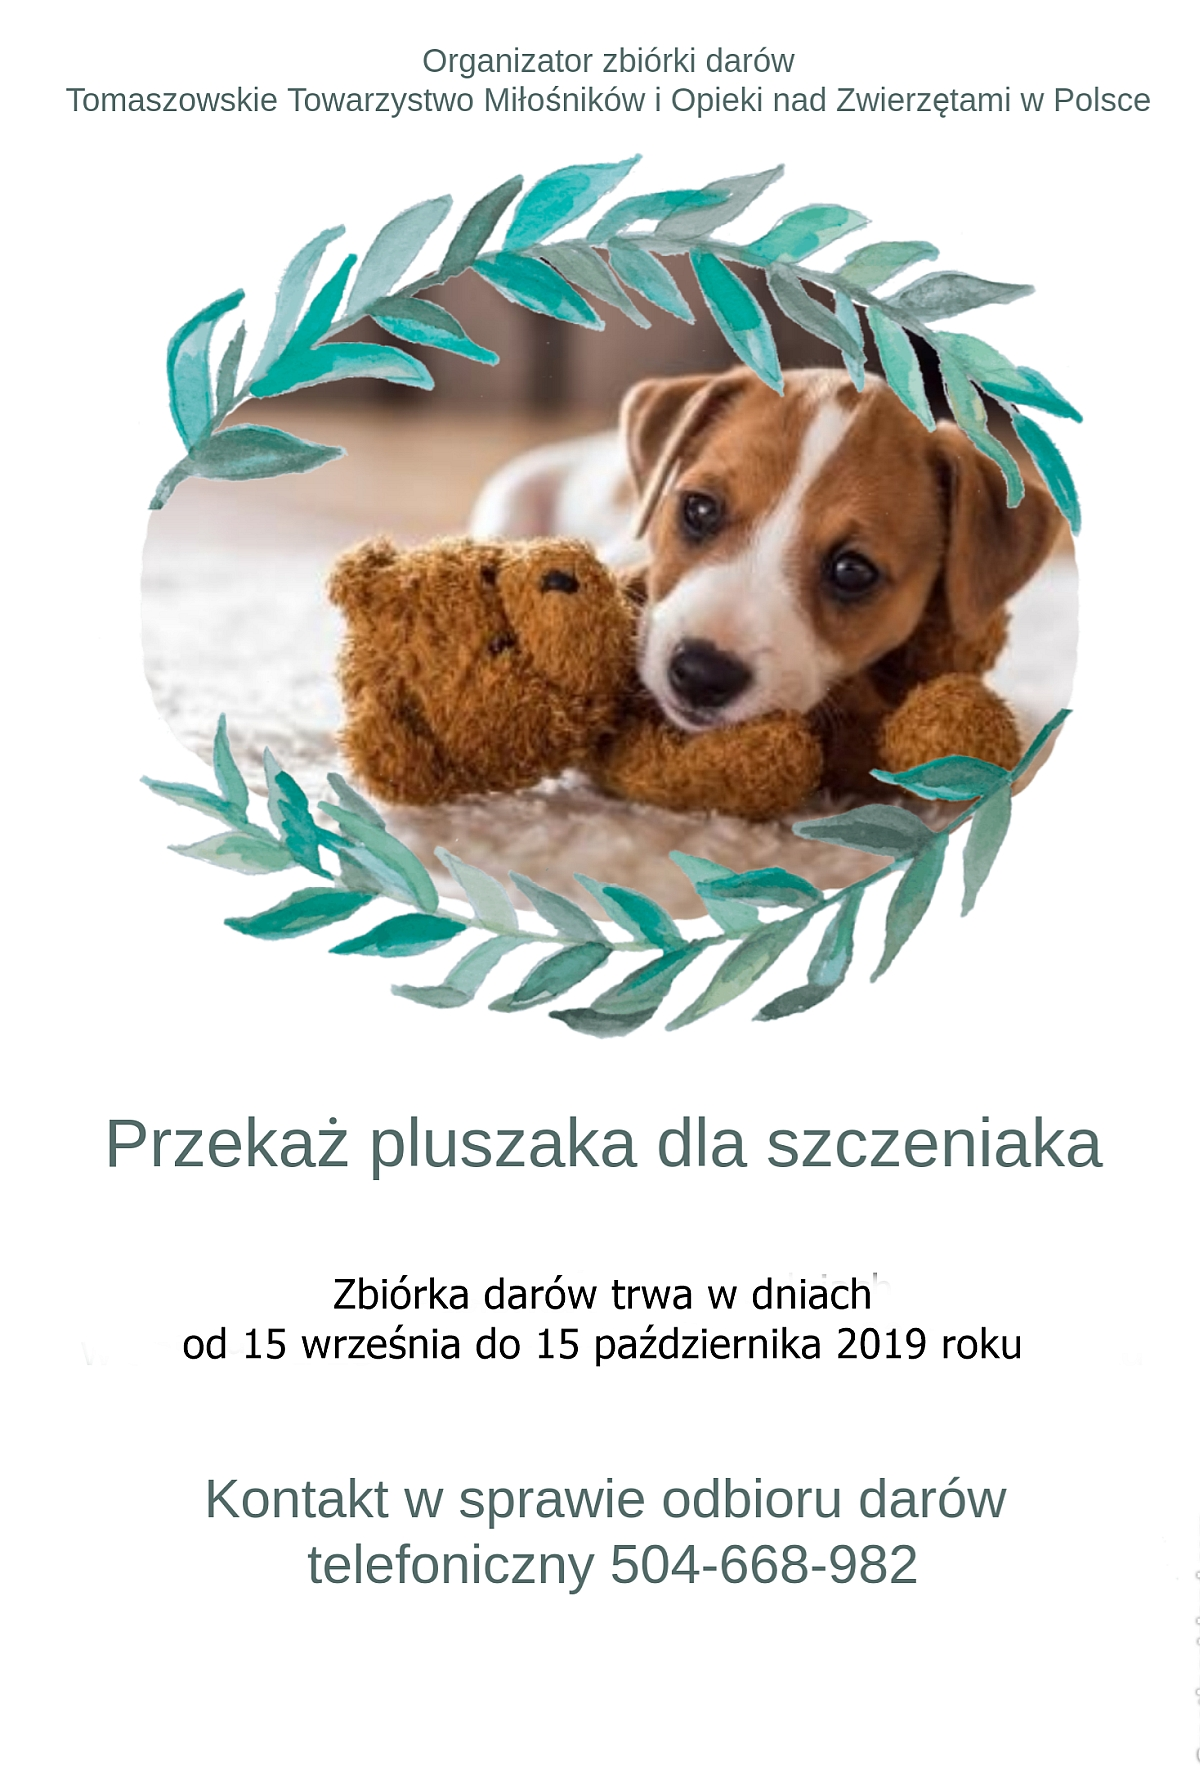 Plakat-zbiorki-darow-korekta.jpg